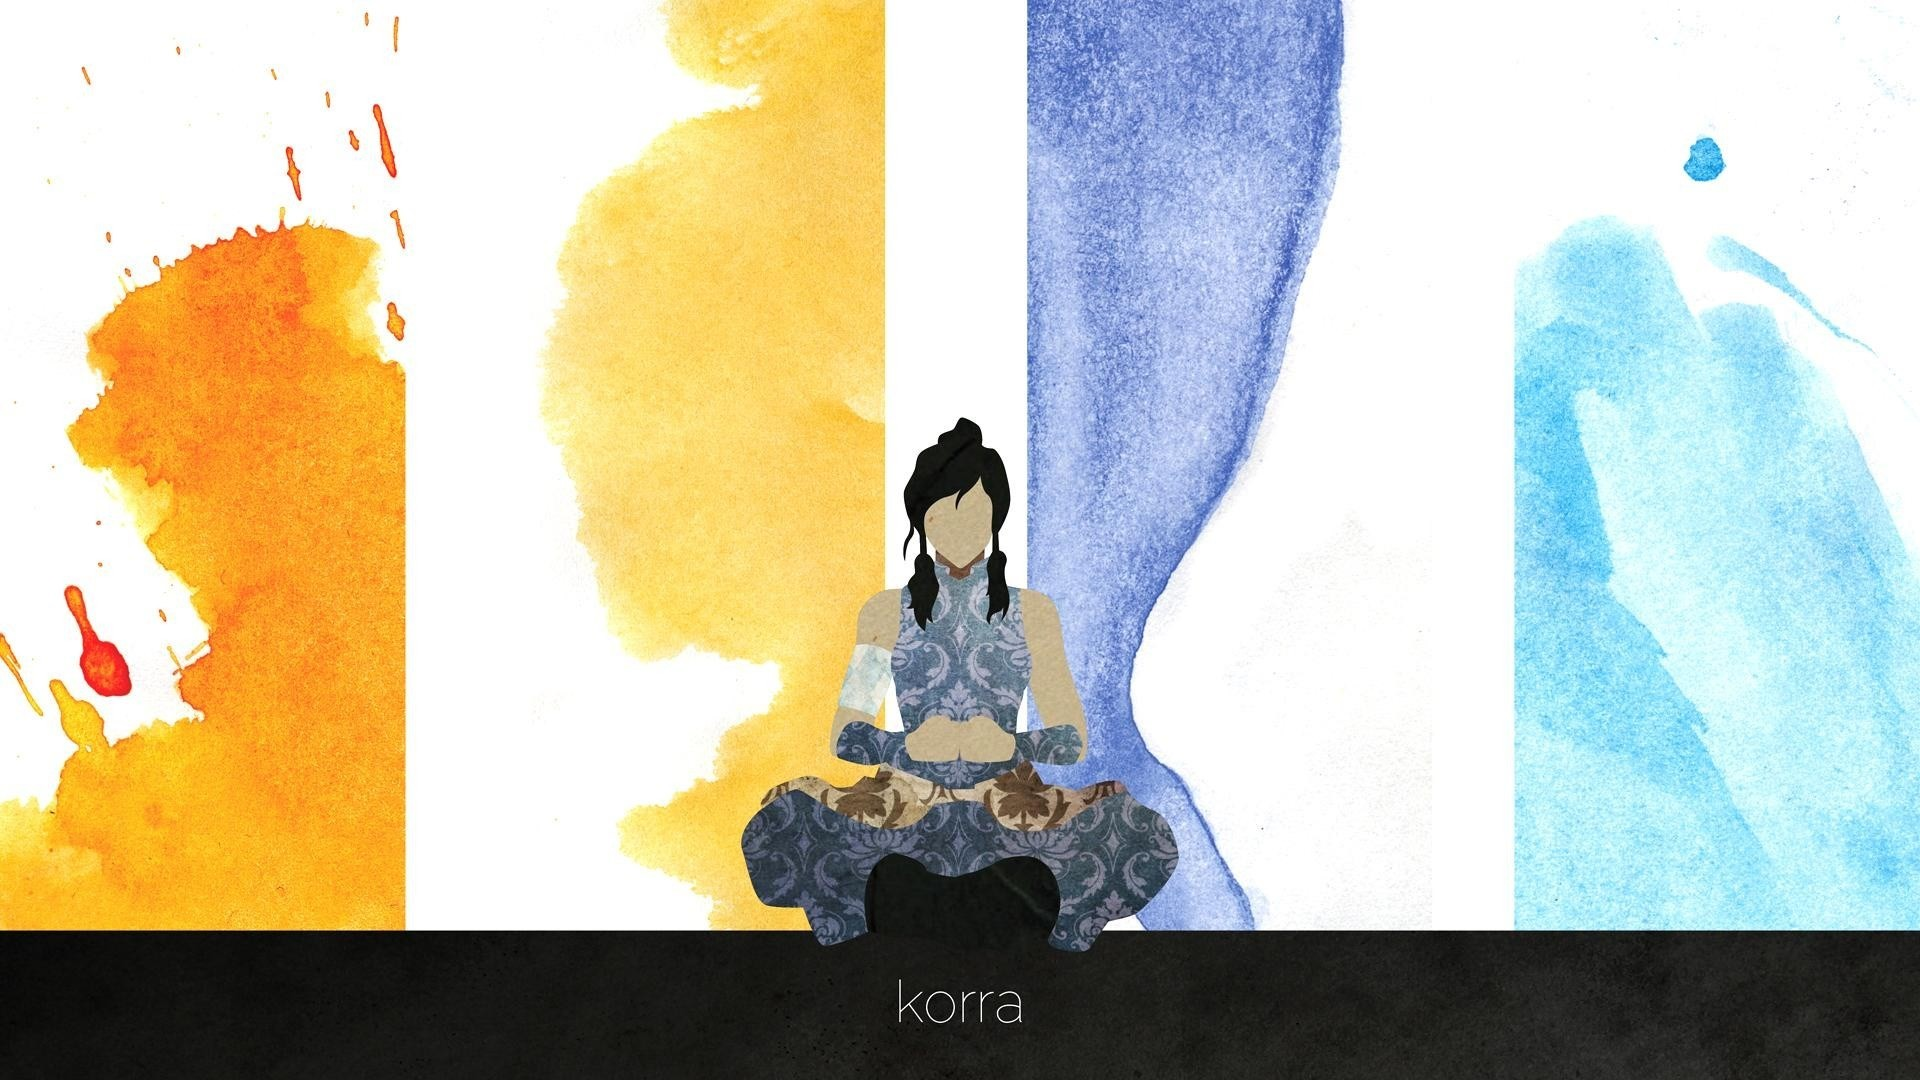 Background High Resolution: avatar the legend of korra